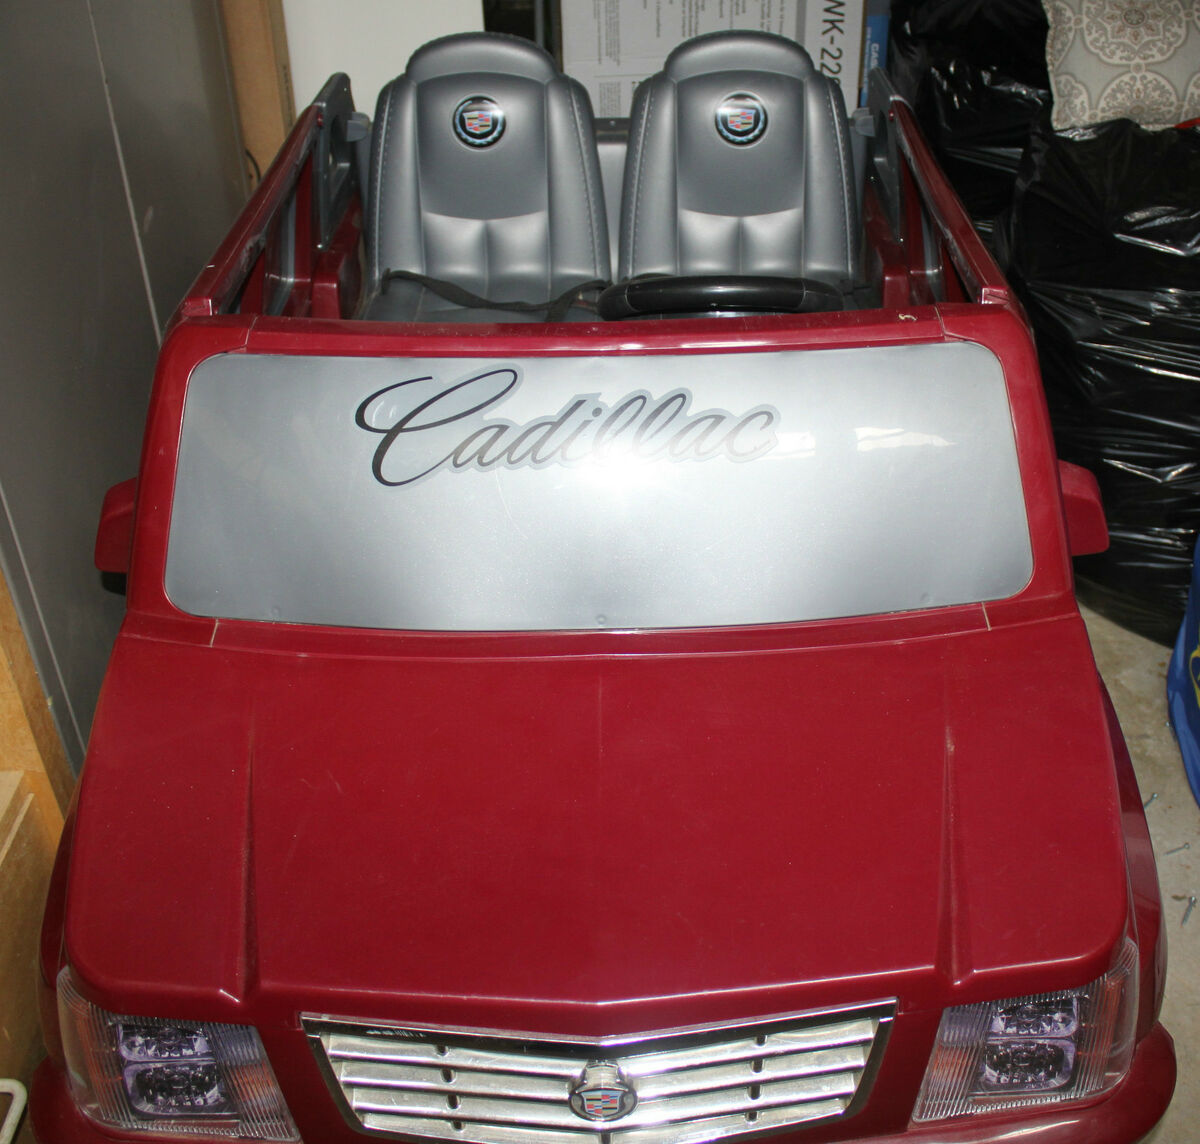 CADILLAC ESCALADE POWER WHEELS RIDE ON CAR   BEAUTIFUL BURGUNDY COLOR